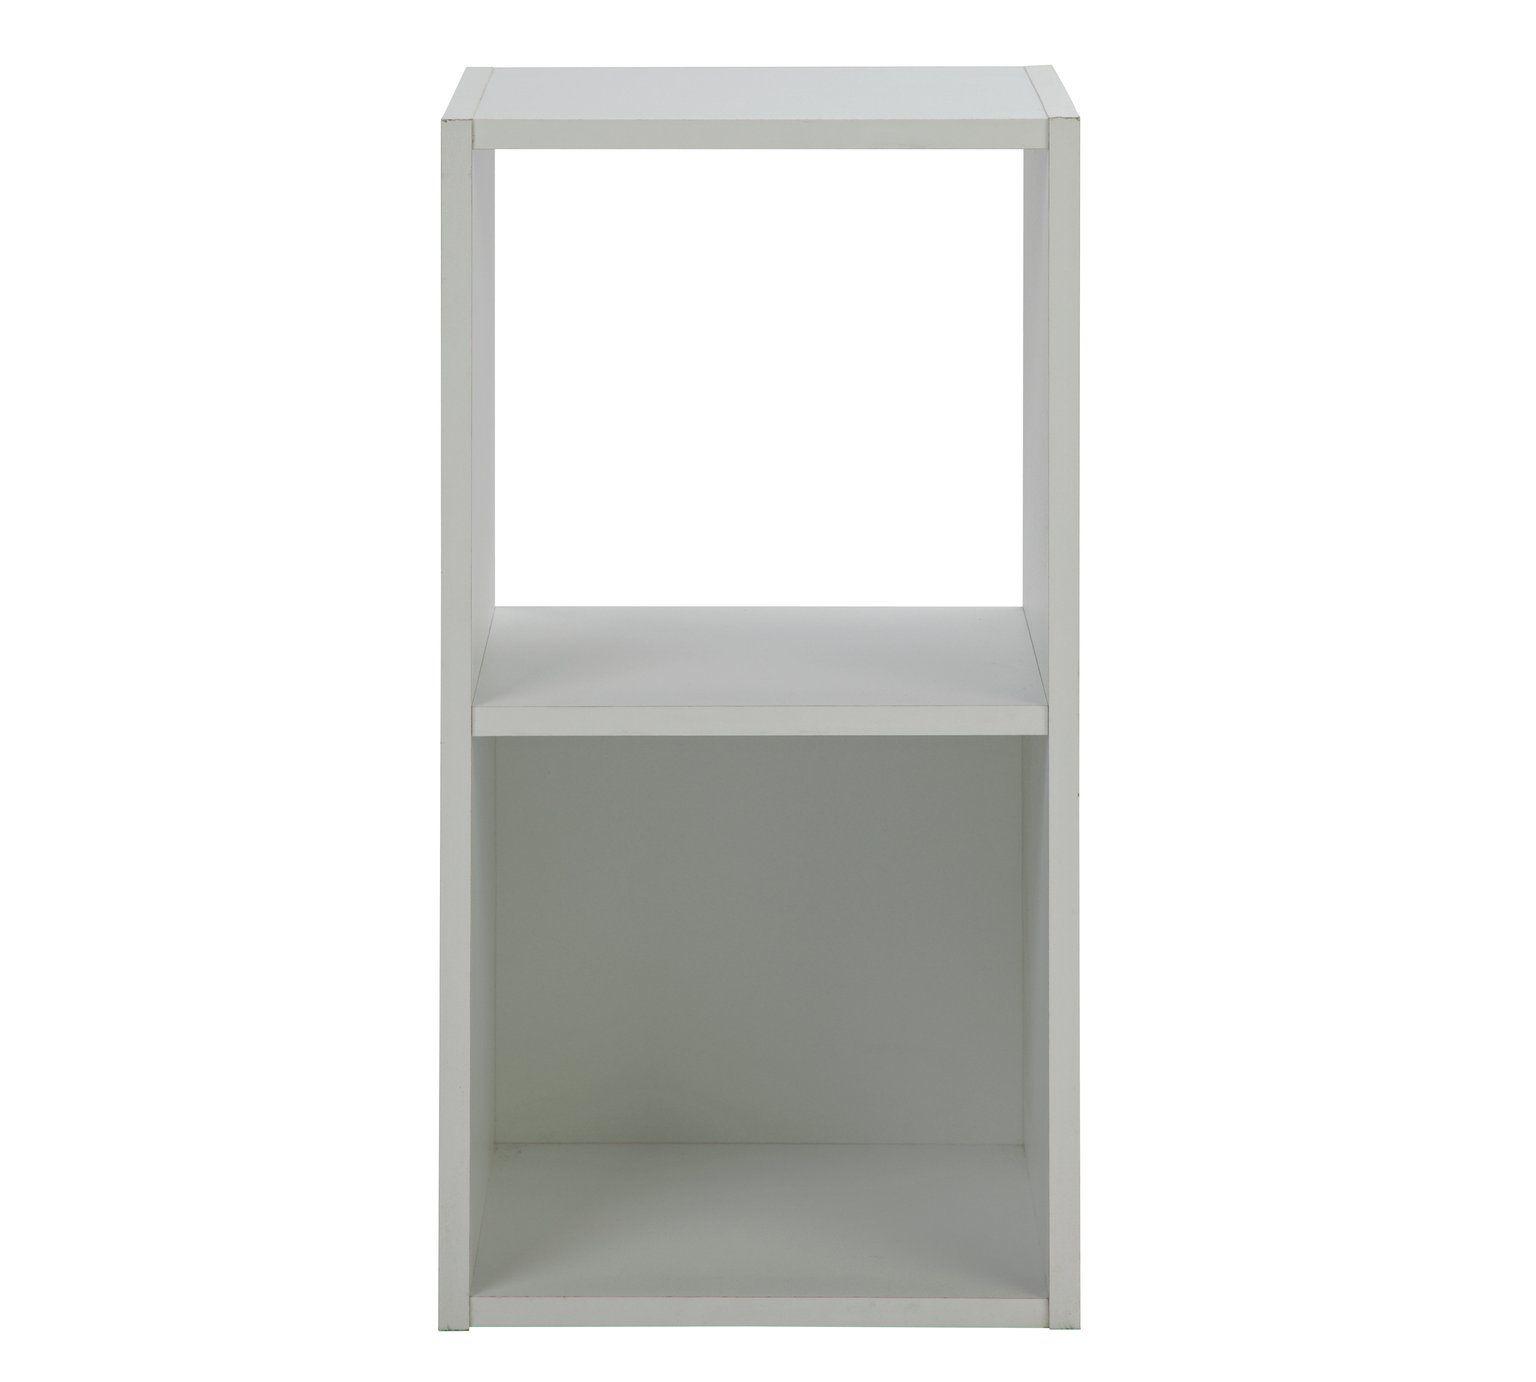 Buy HOME Squares 2 Cube Storage Unit - White at Argos.co.uk  sc 1 st  Pinterest & Buy HOME Squares 2 Cube Storage Unit - White at Argos.co.uk visit ...